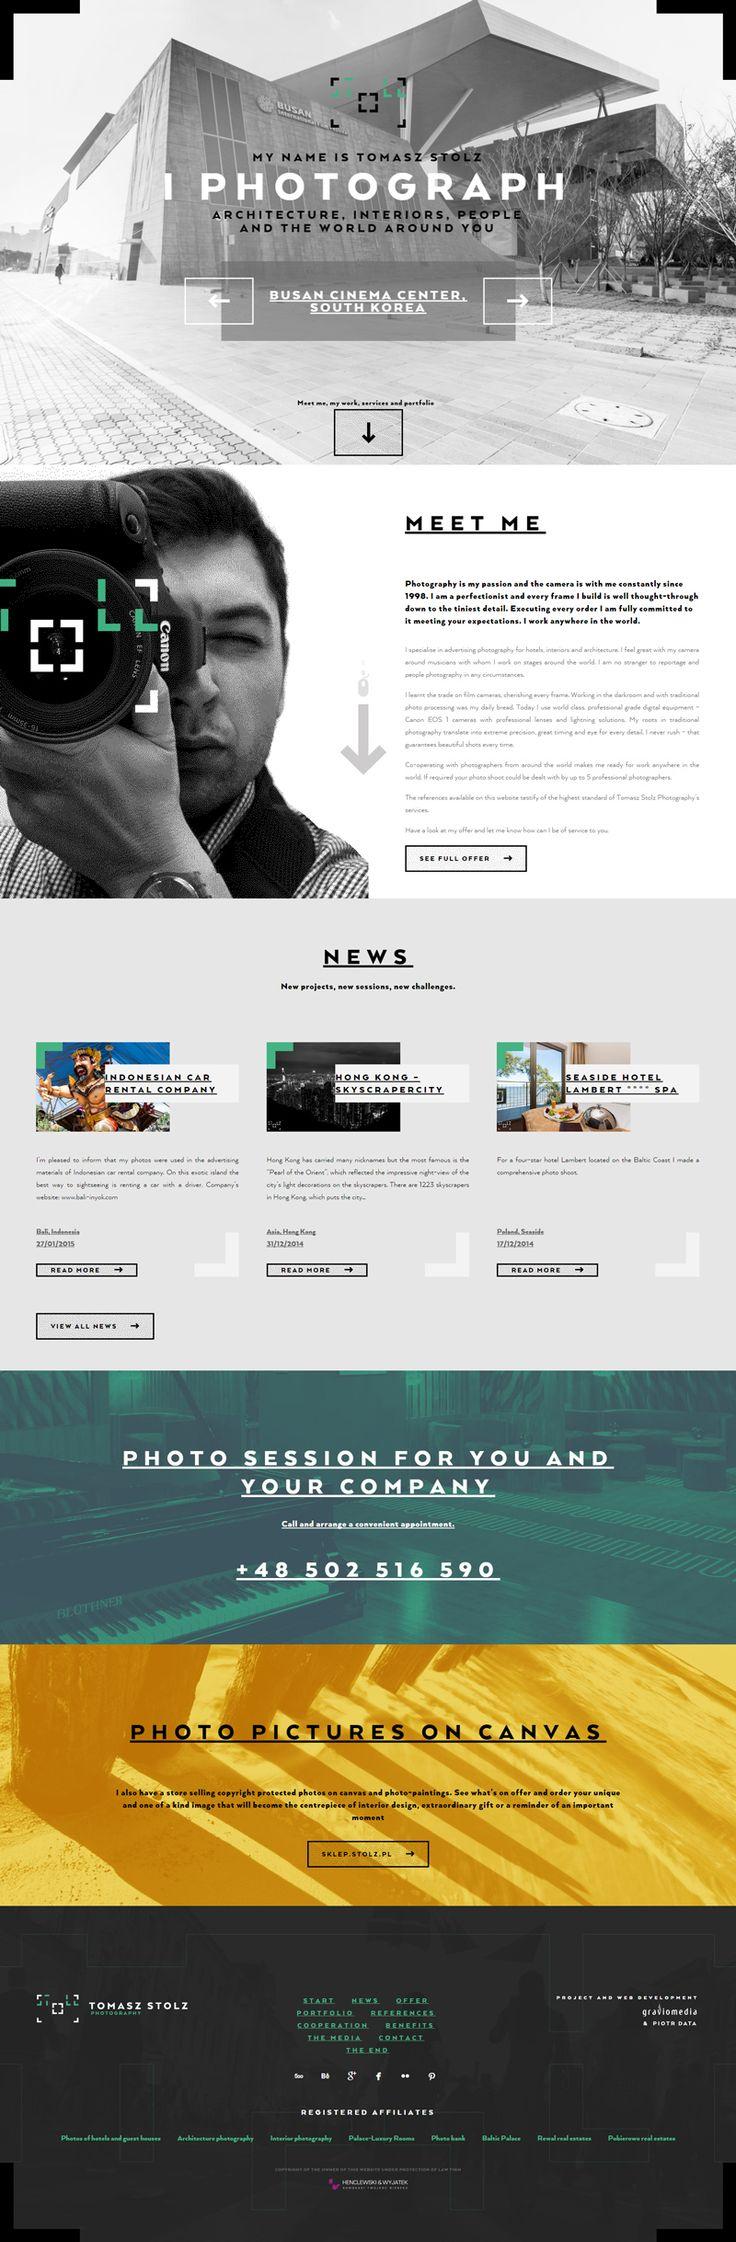 Stolz, Daily Design Inspiration 8